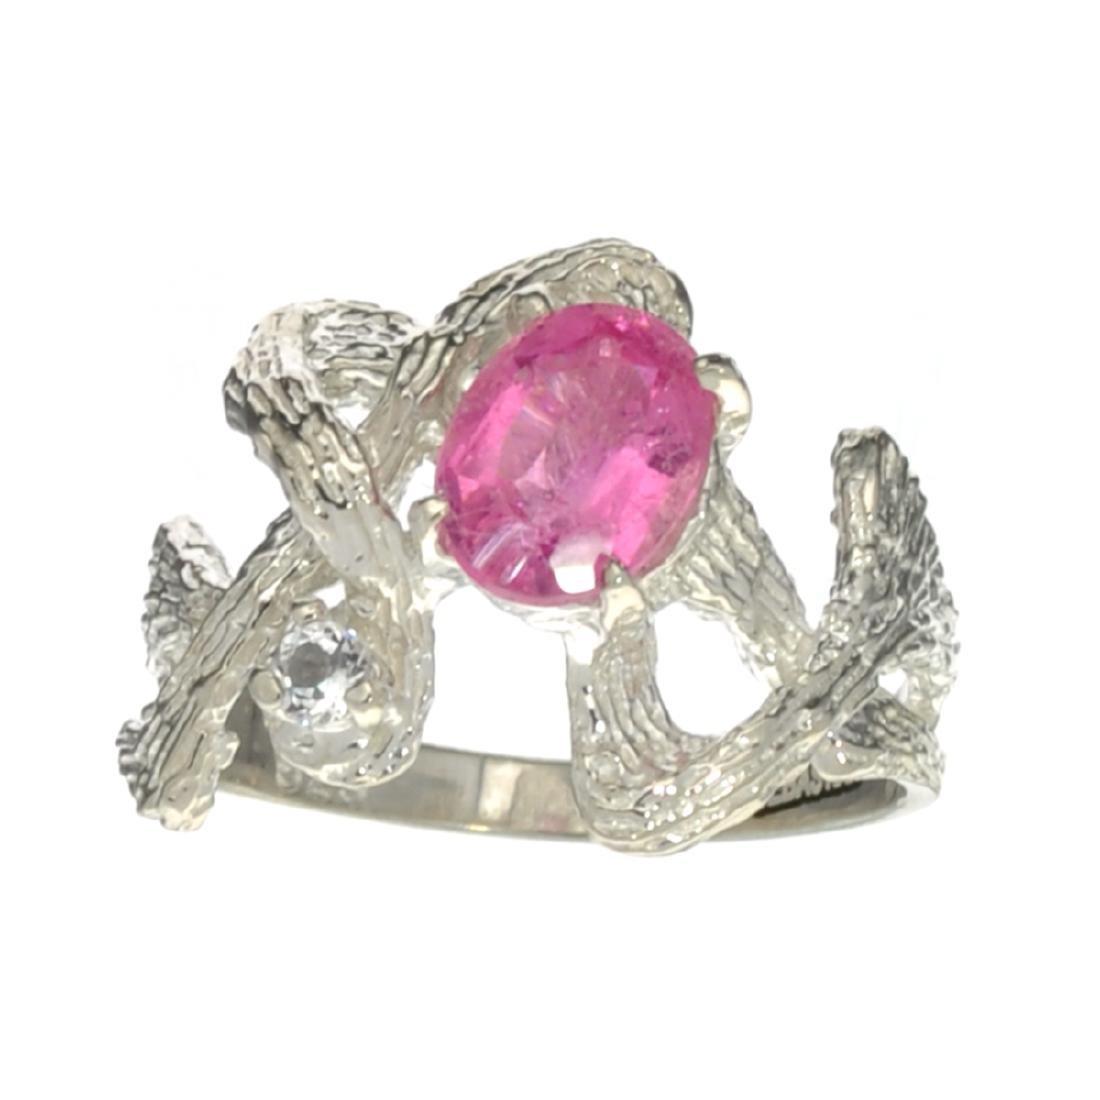 APP: 0.5k Fine Jewelry Designer Sebastian, 1.60CT Pink